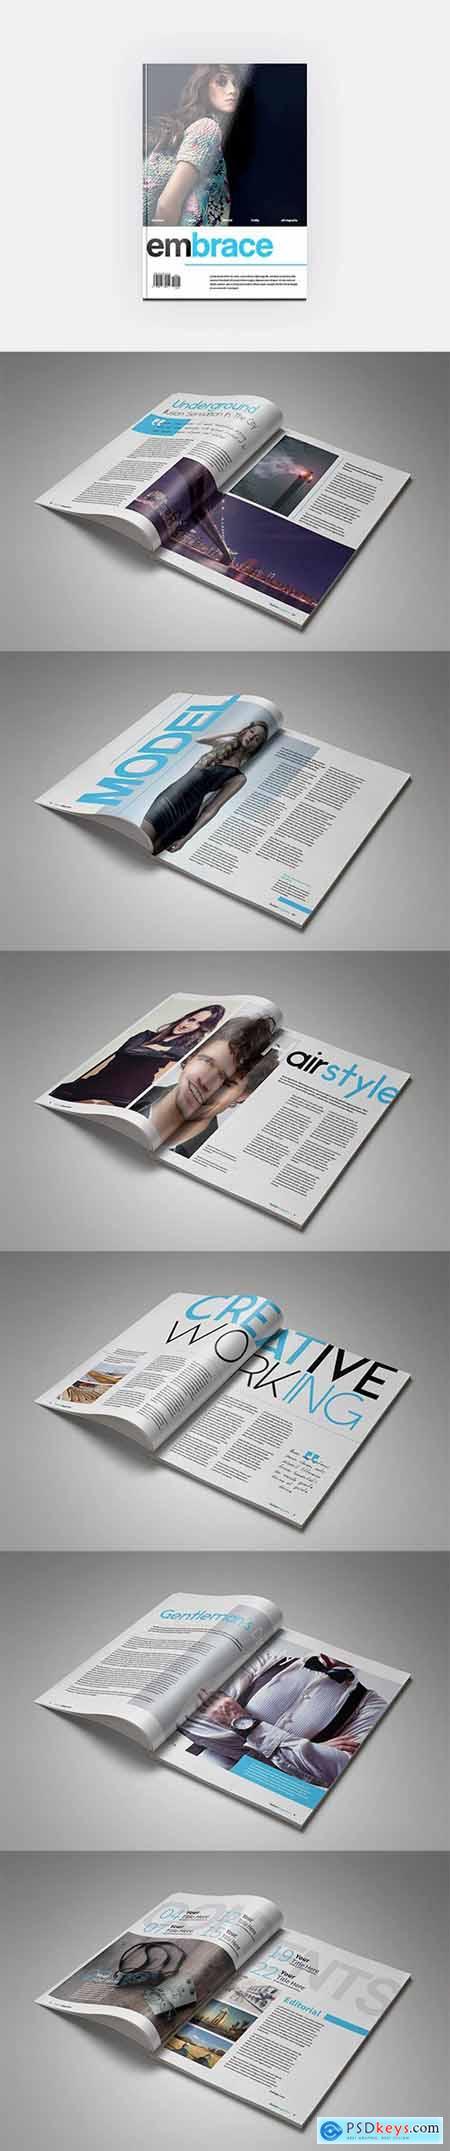 HQ - Letter Embraced Magazine V5